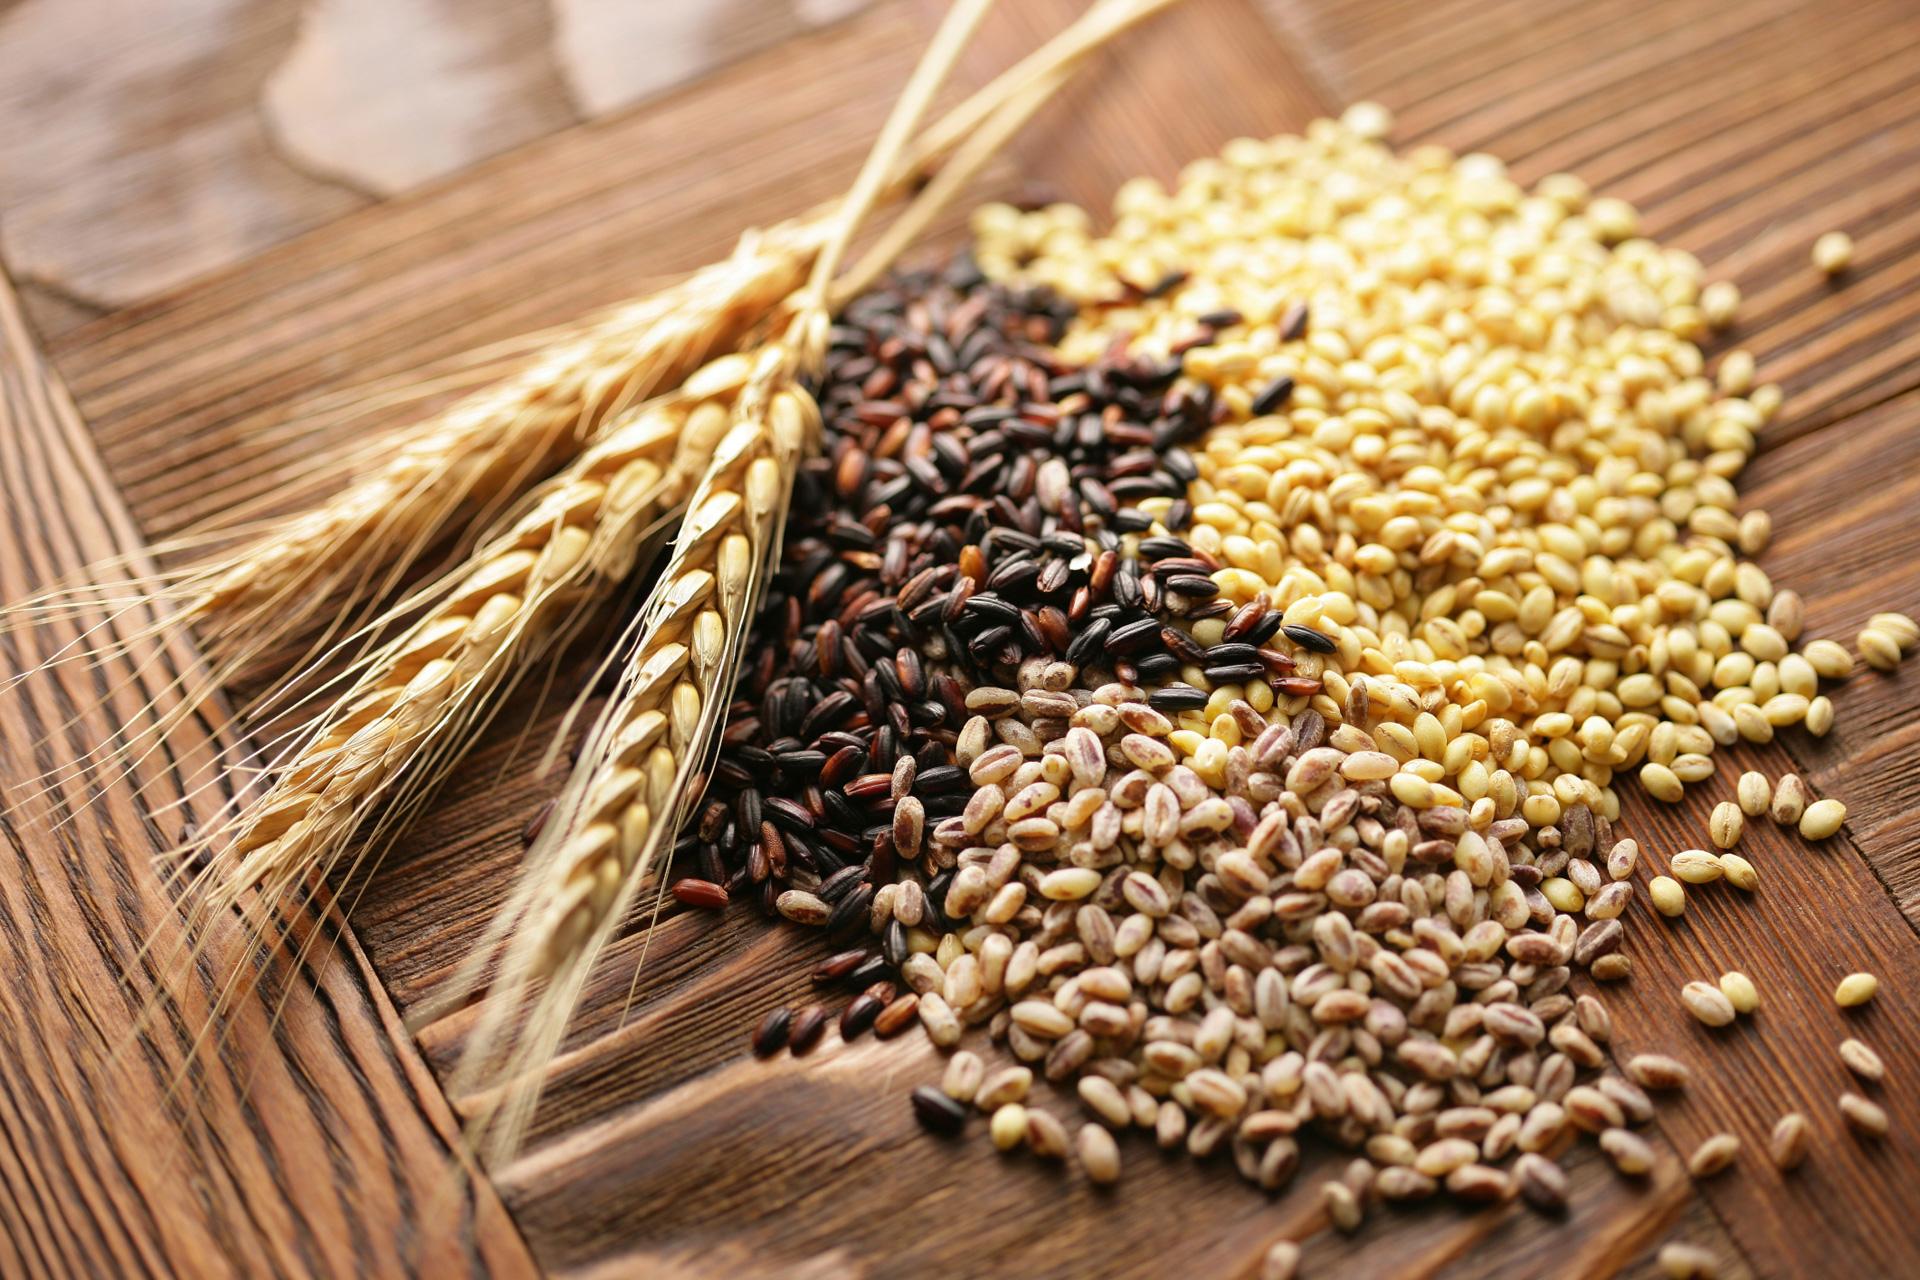 Whole grains (brown rice, millet, barley)